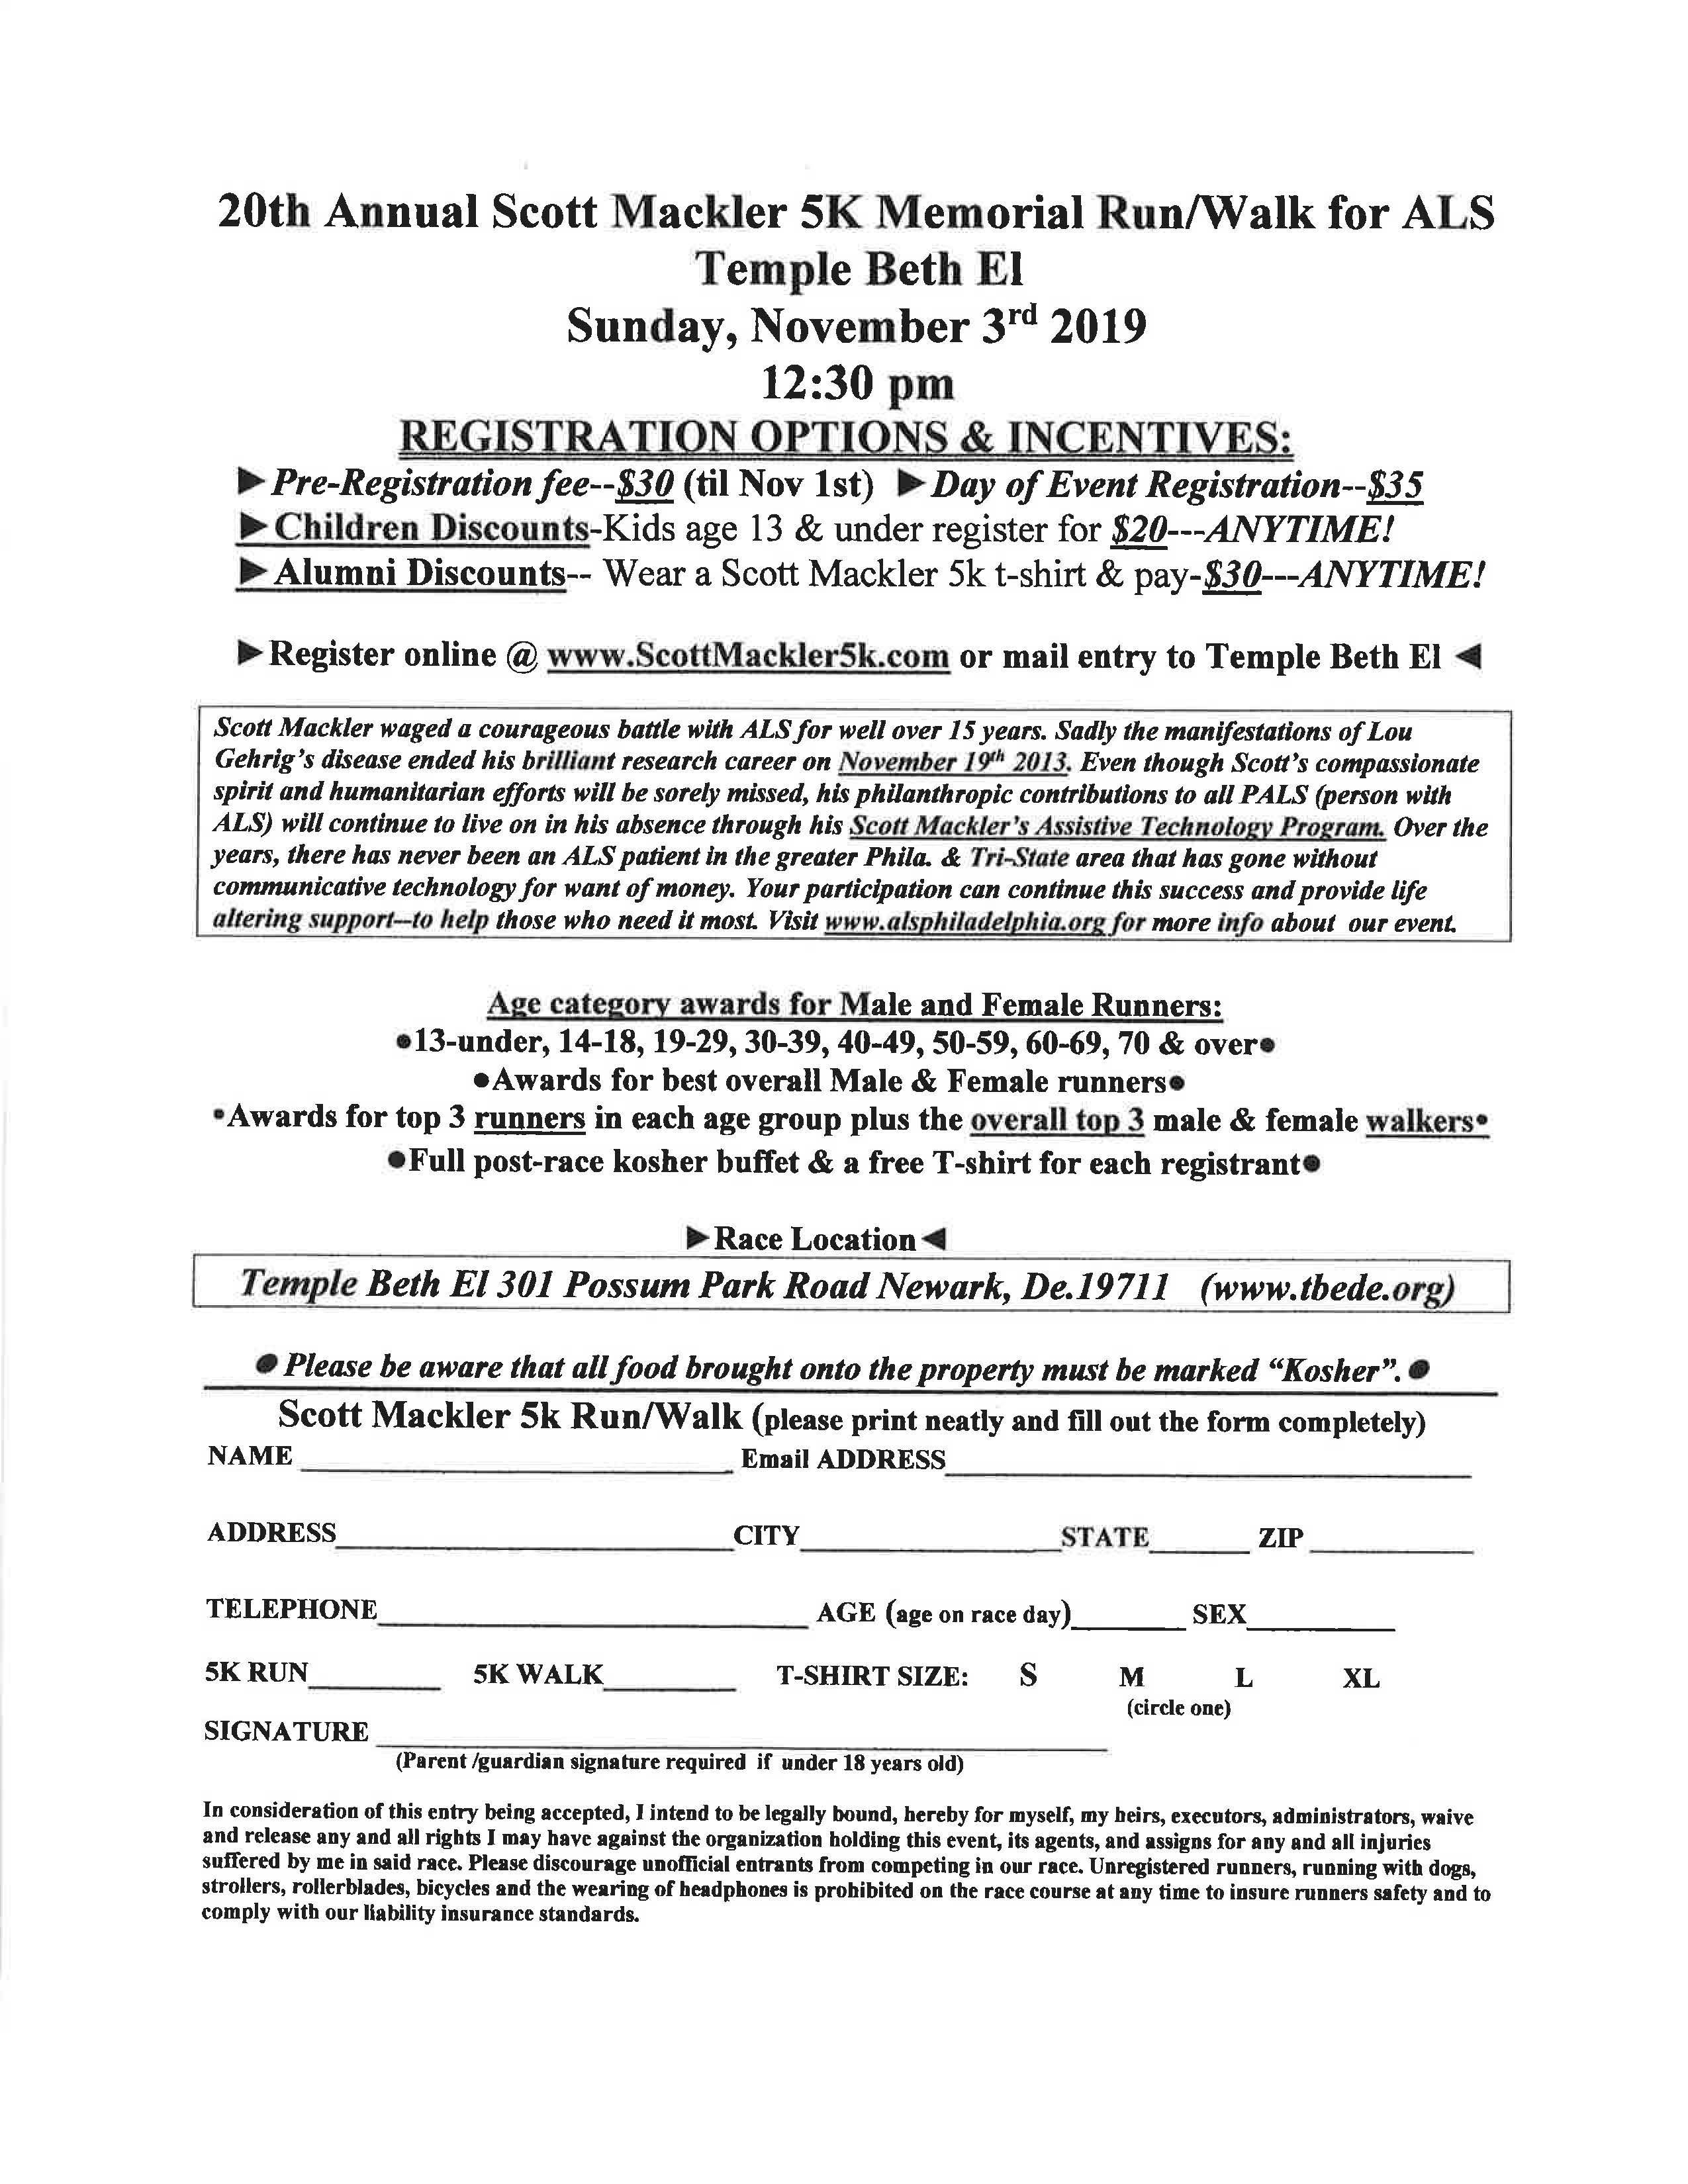 20th Annual Scott Mackler 5k Memorial Run/Walk for ALS